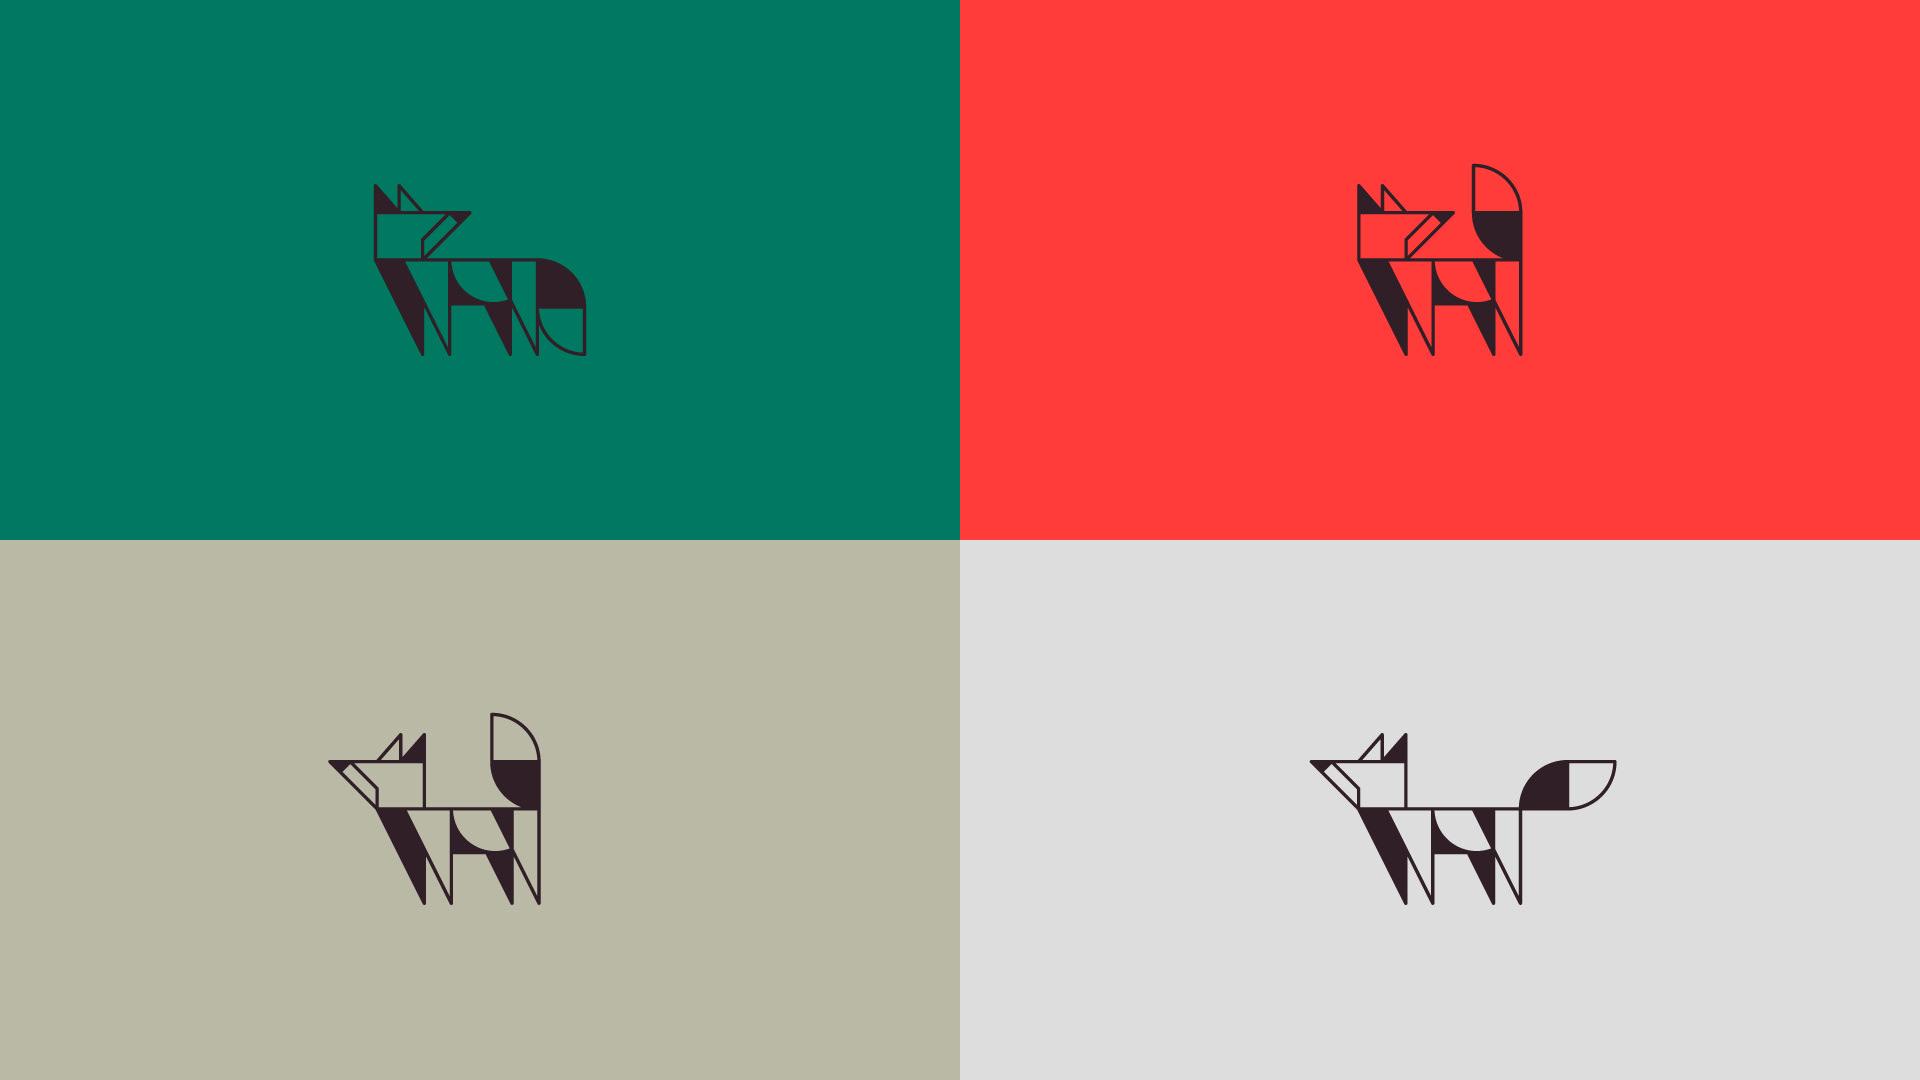 Branding and Graphic Design - Illustration